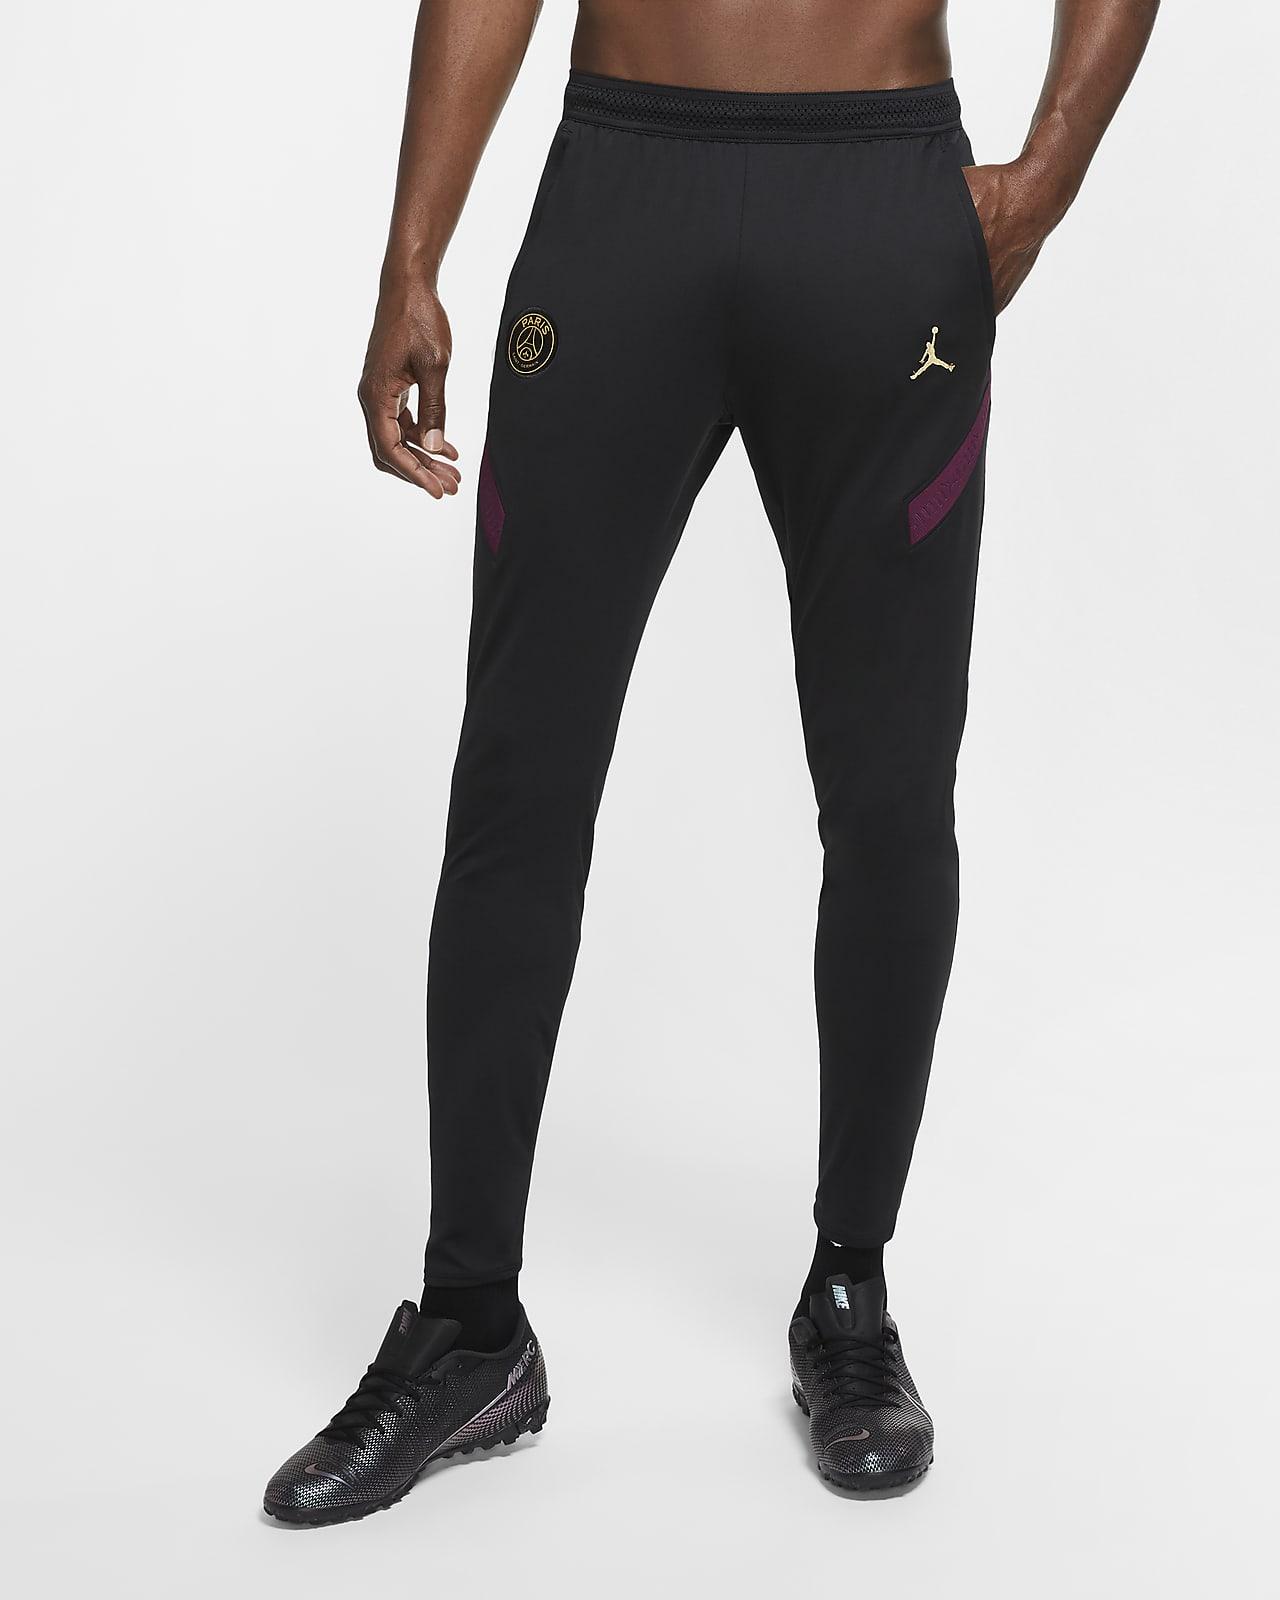 Pantaloni da calcio in maglia Paris Saint-Germain Strike - Uomo